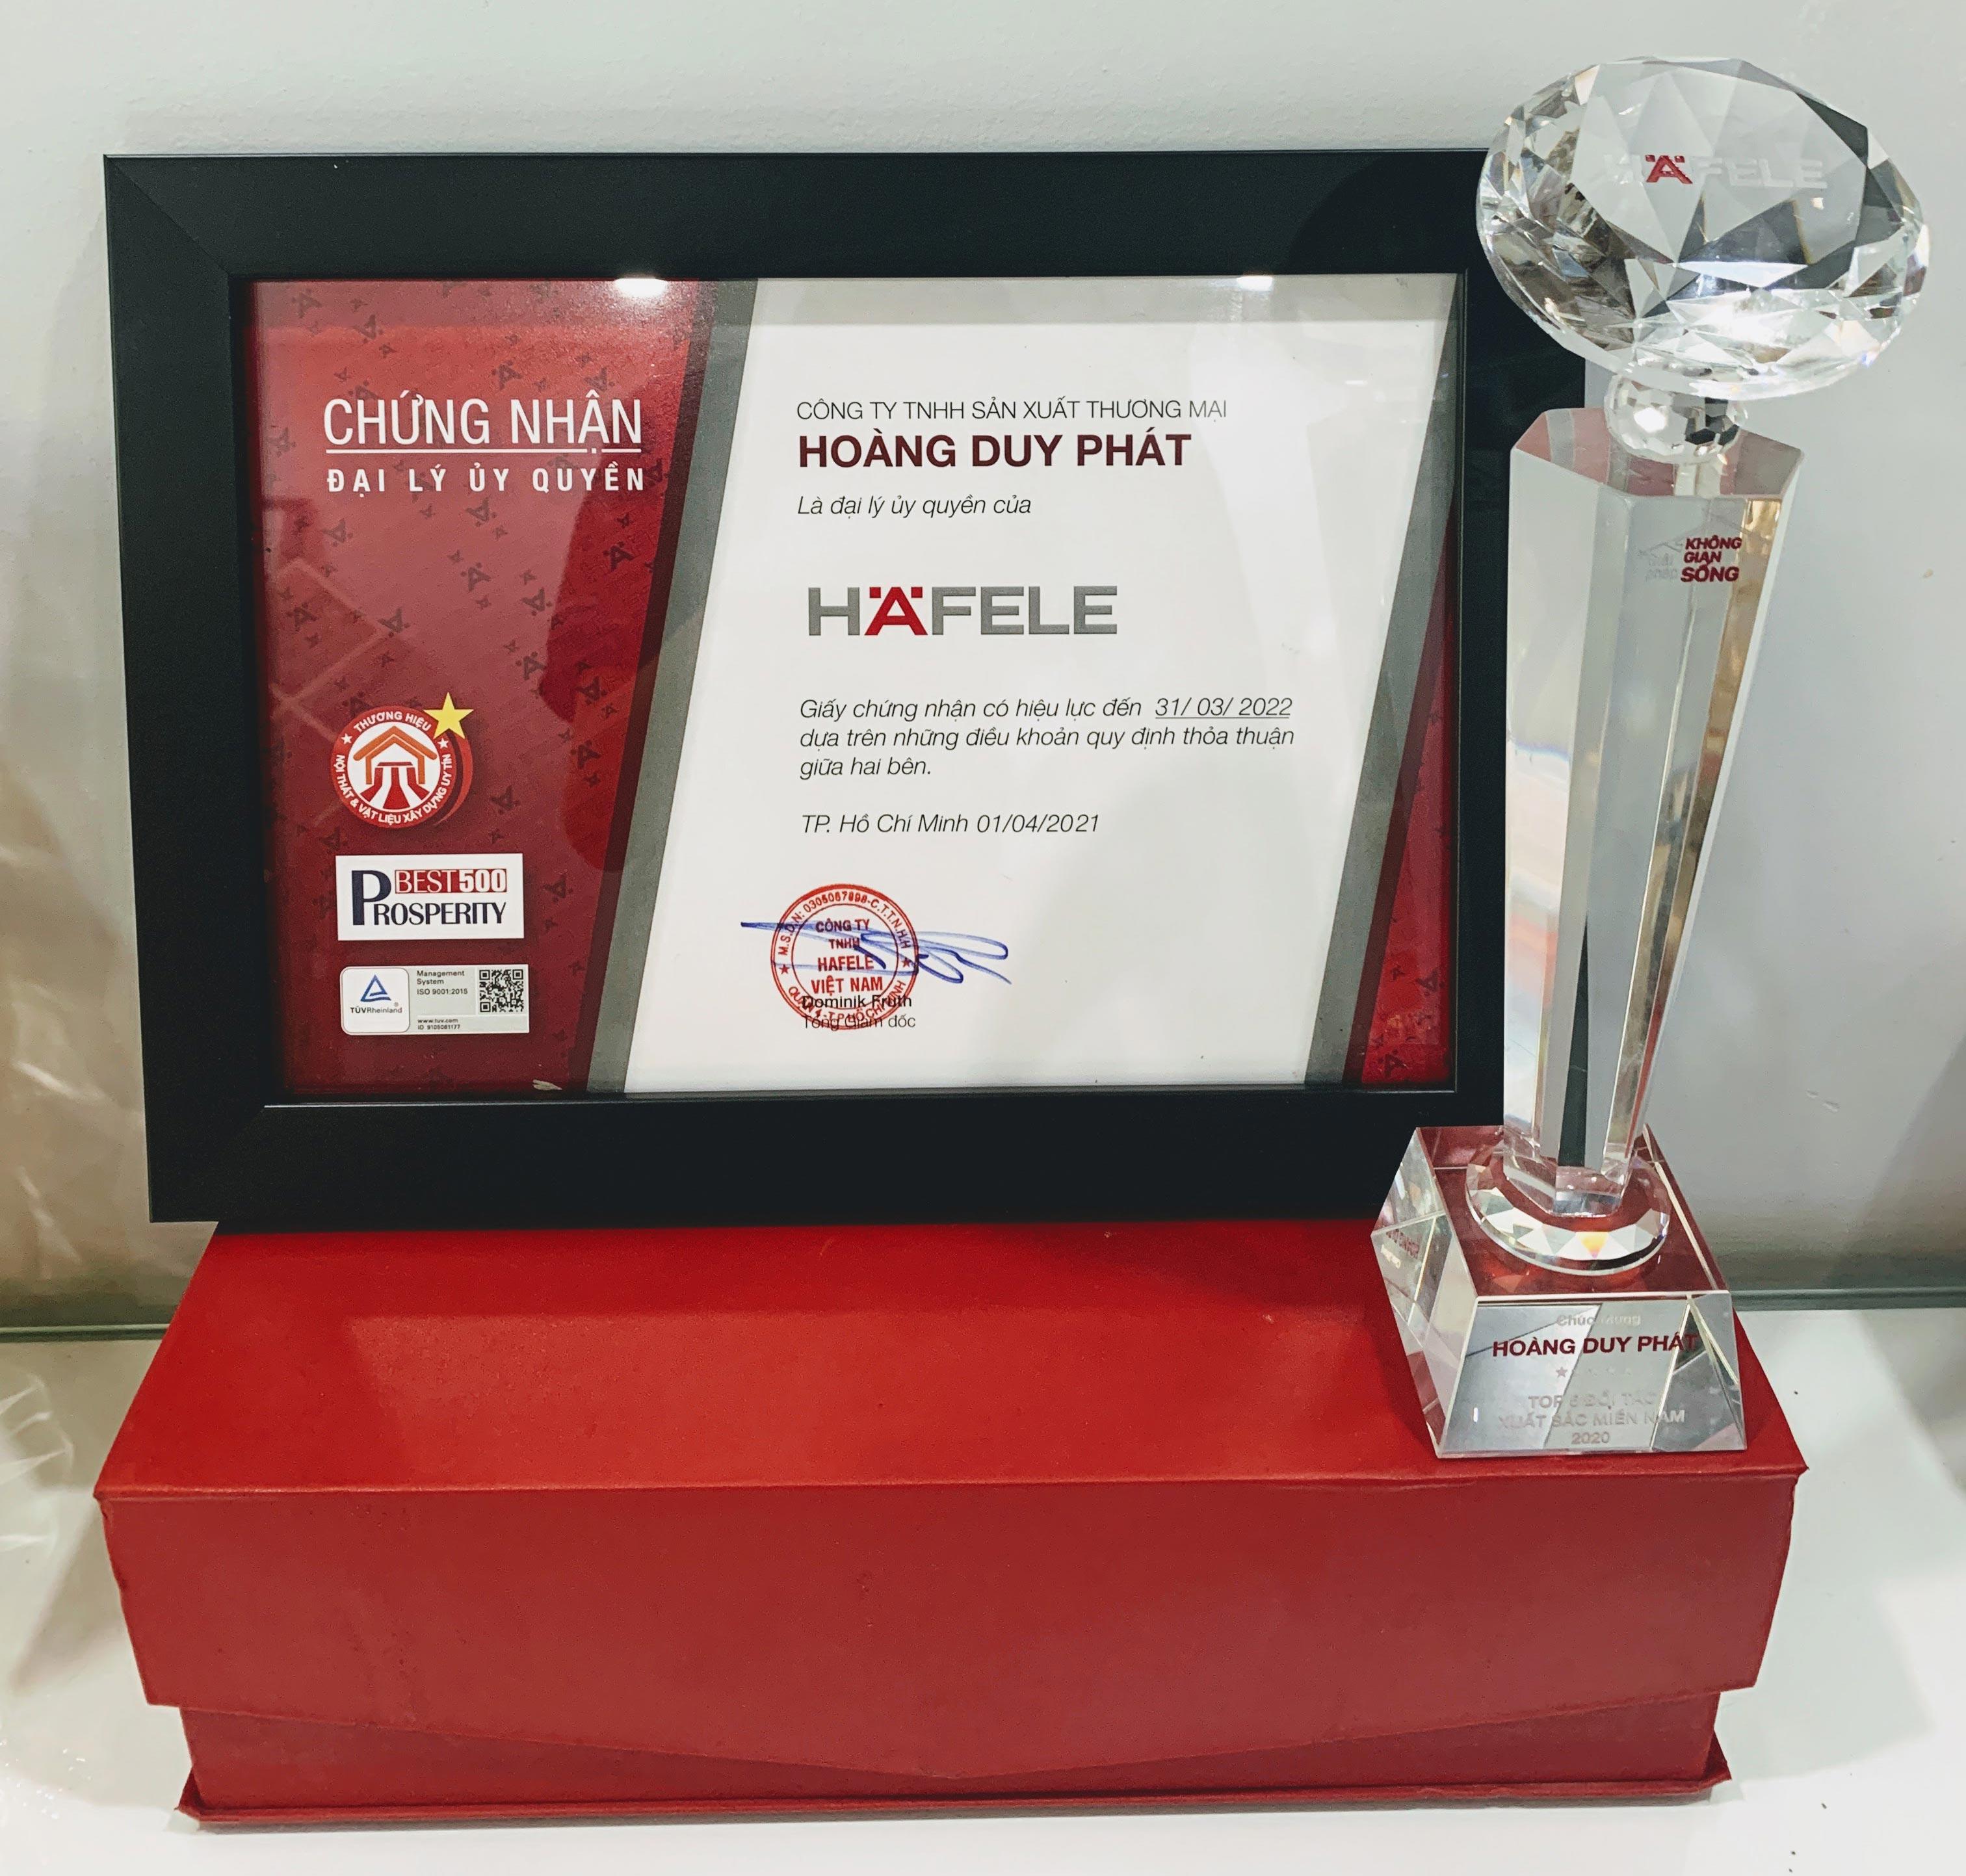 Chung Nhan Dai Ly Hafele 2020 2021 900x653px